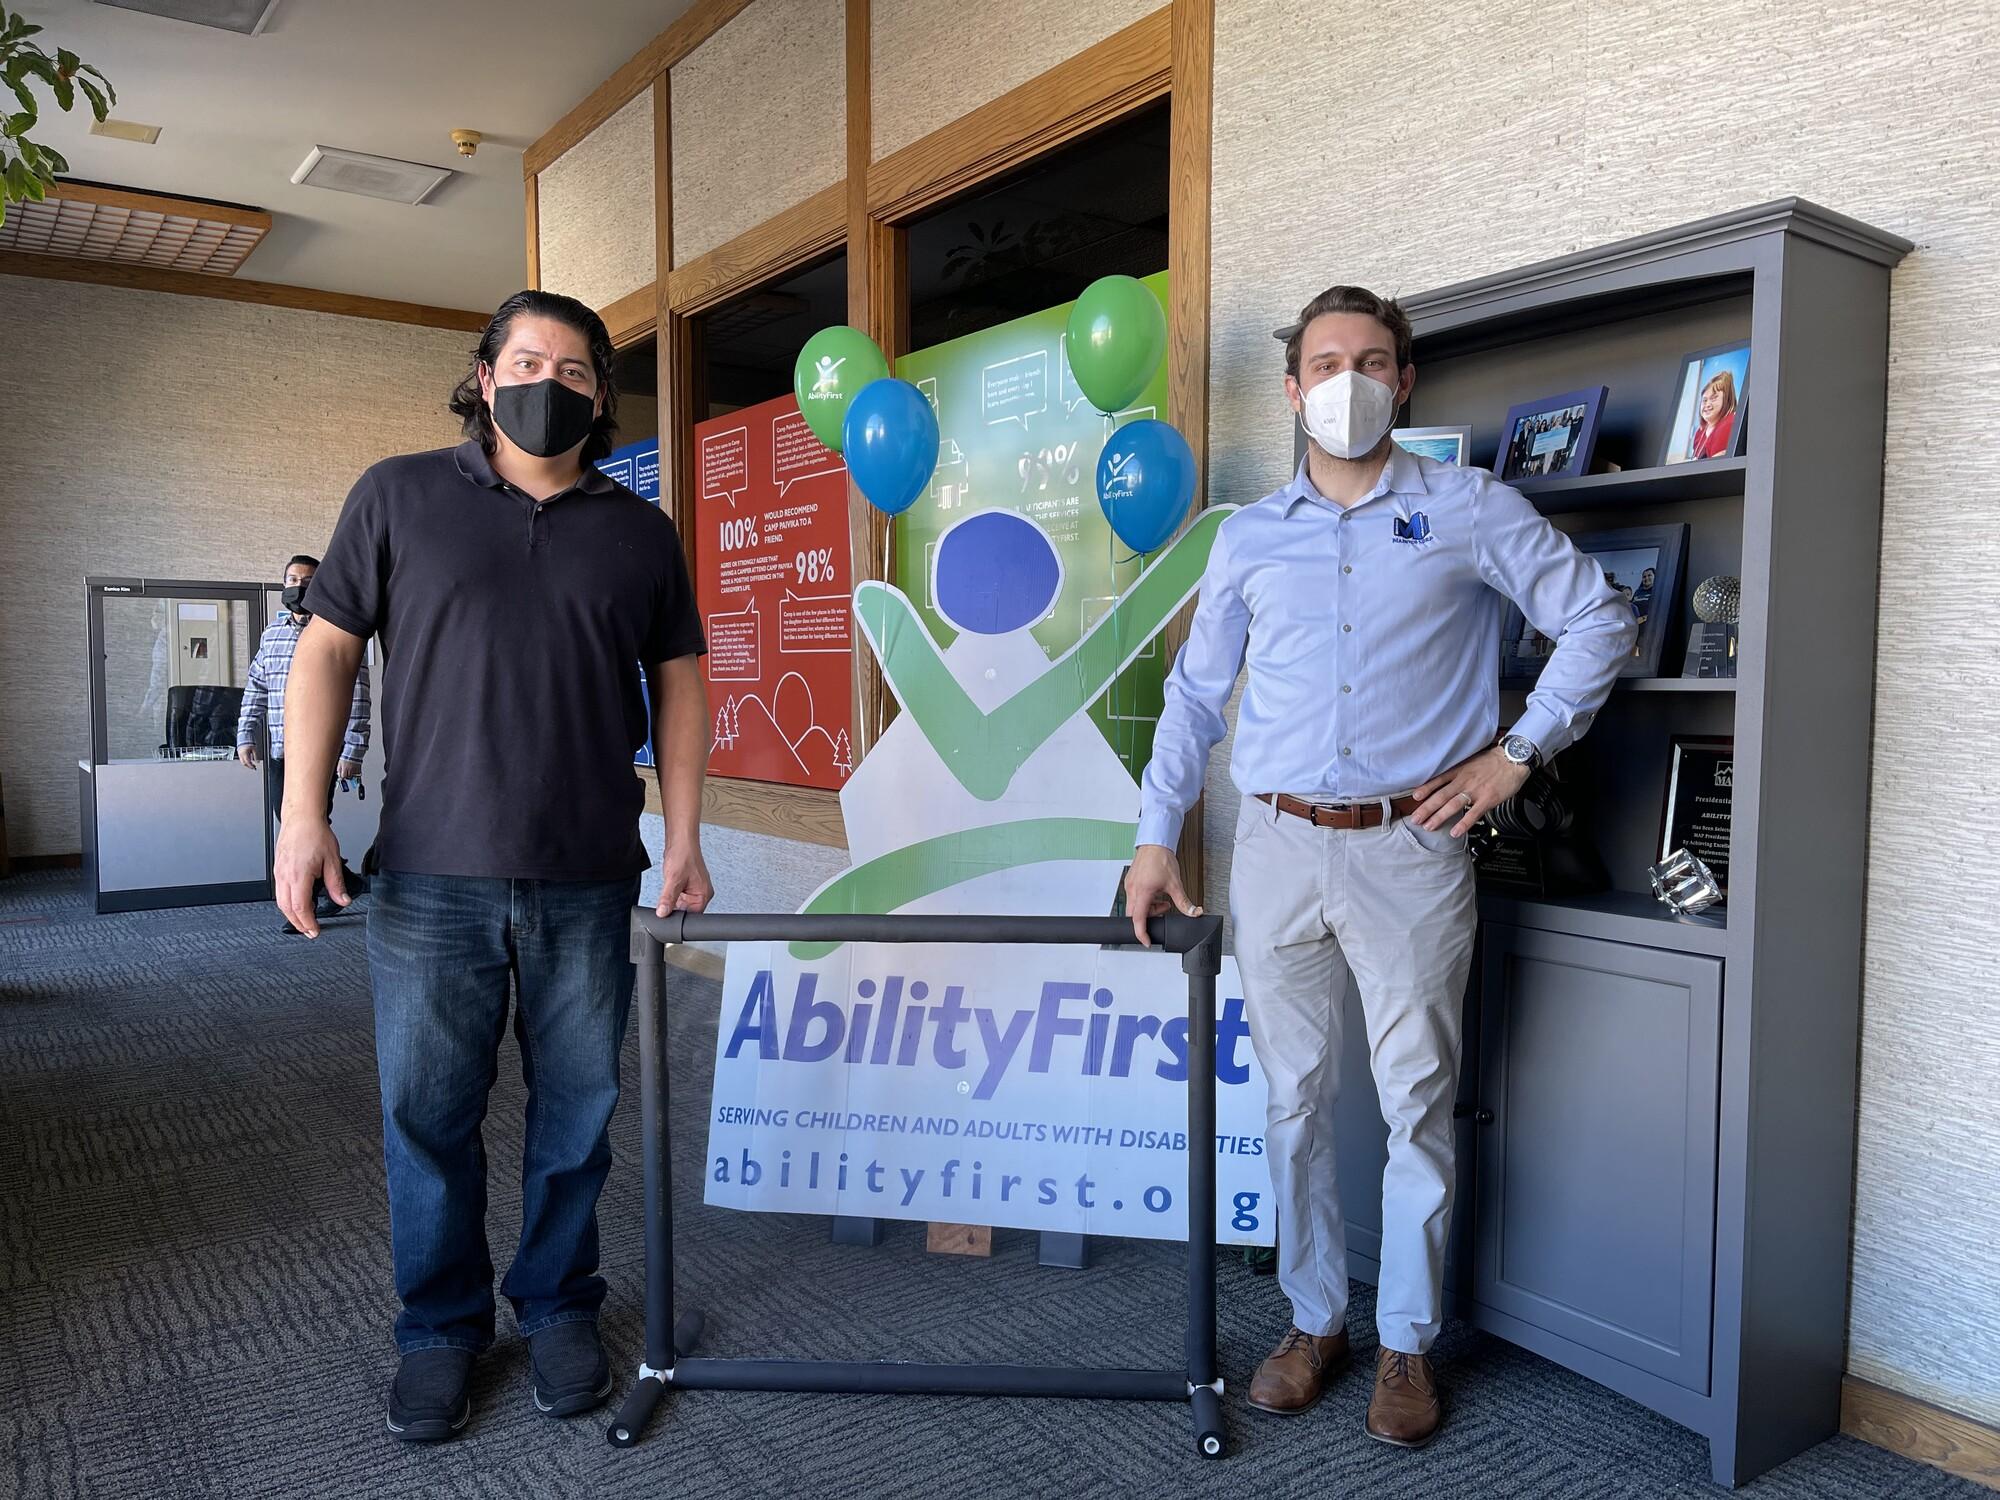 Maintco Corp's Alan Radojcic and AbilityFirst's Oscar Franco smiling next to sneeze guard for photo